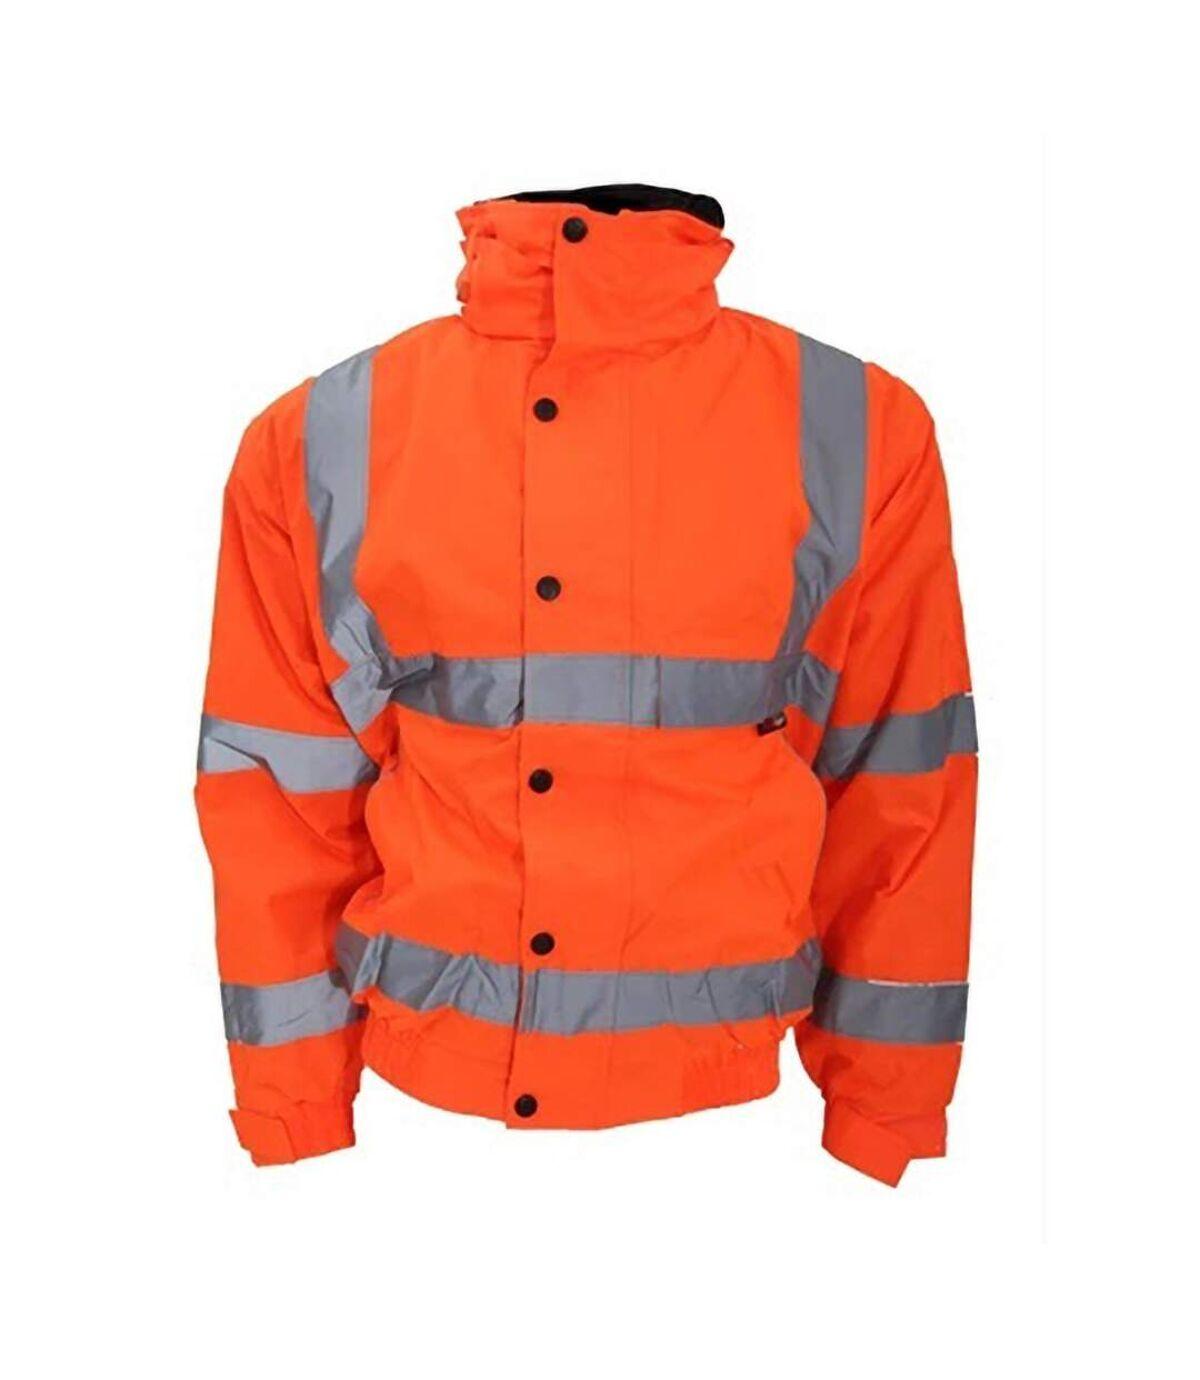 Warrior Mens Tulsa Hi-Vis Bomber Jacket (Fluorescent Orange) - UTPC3501